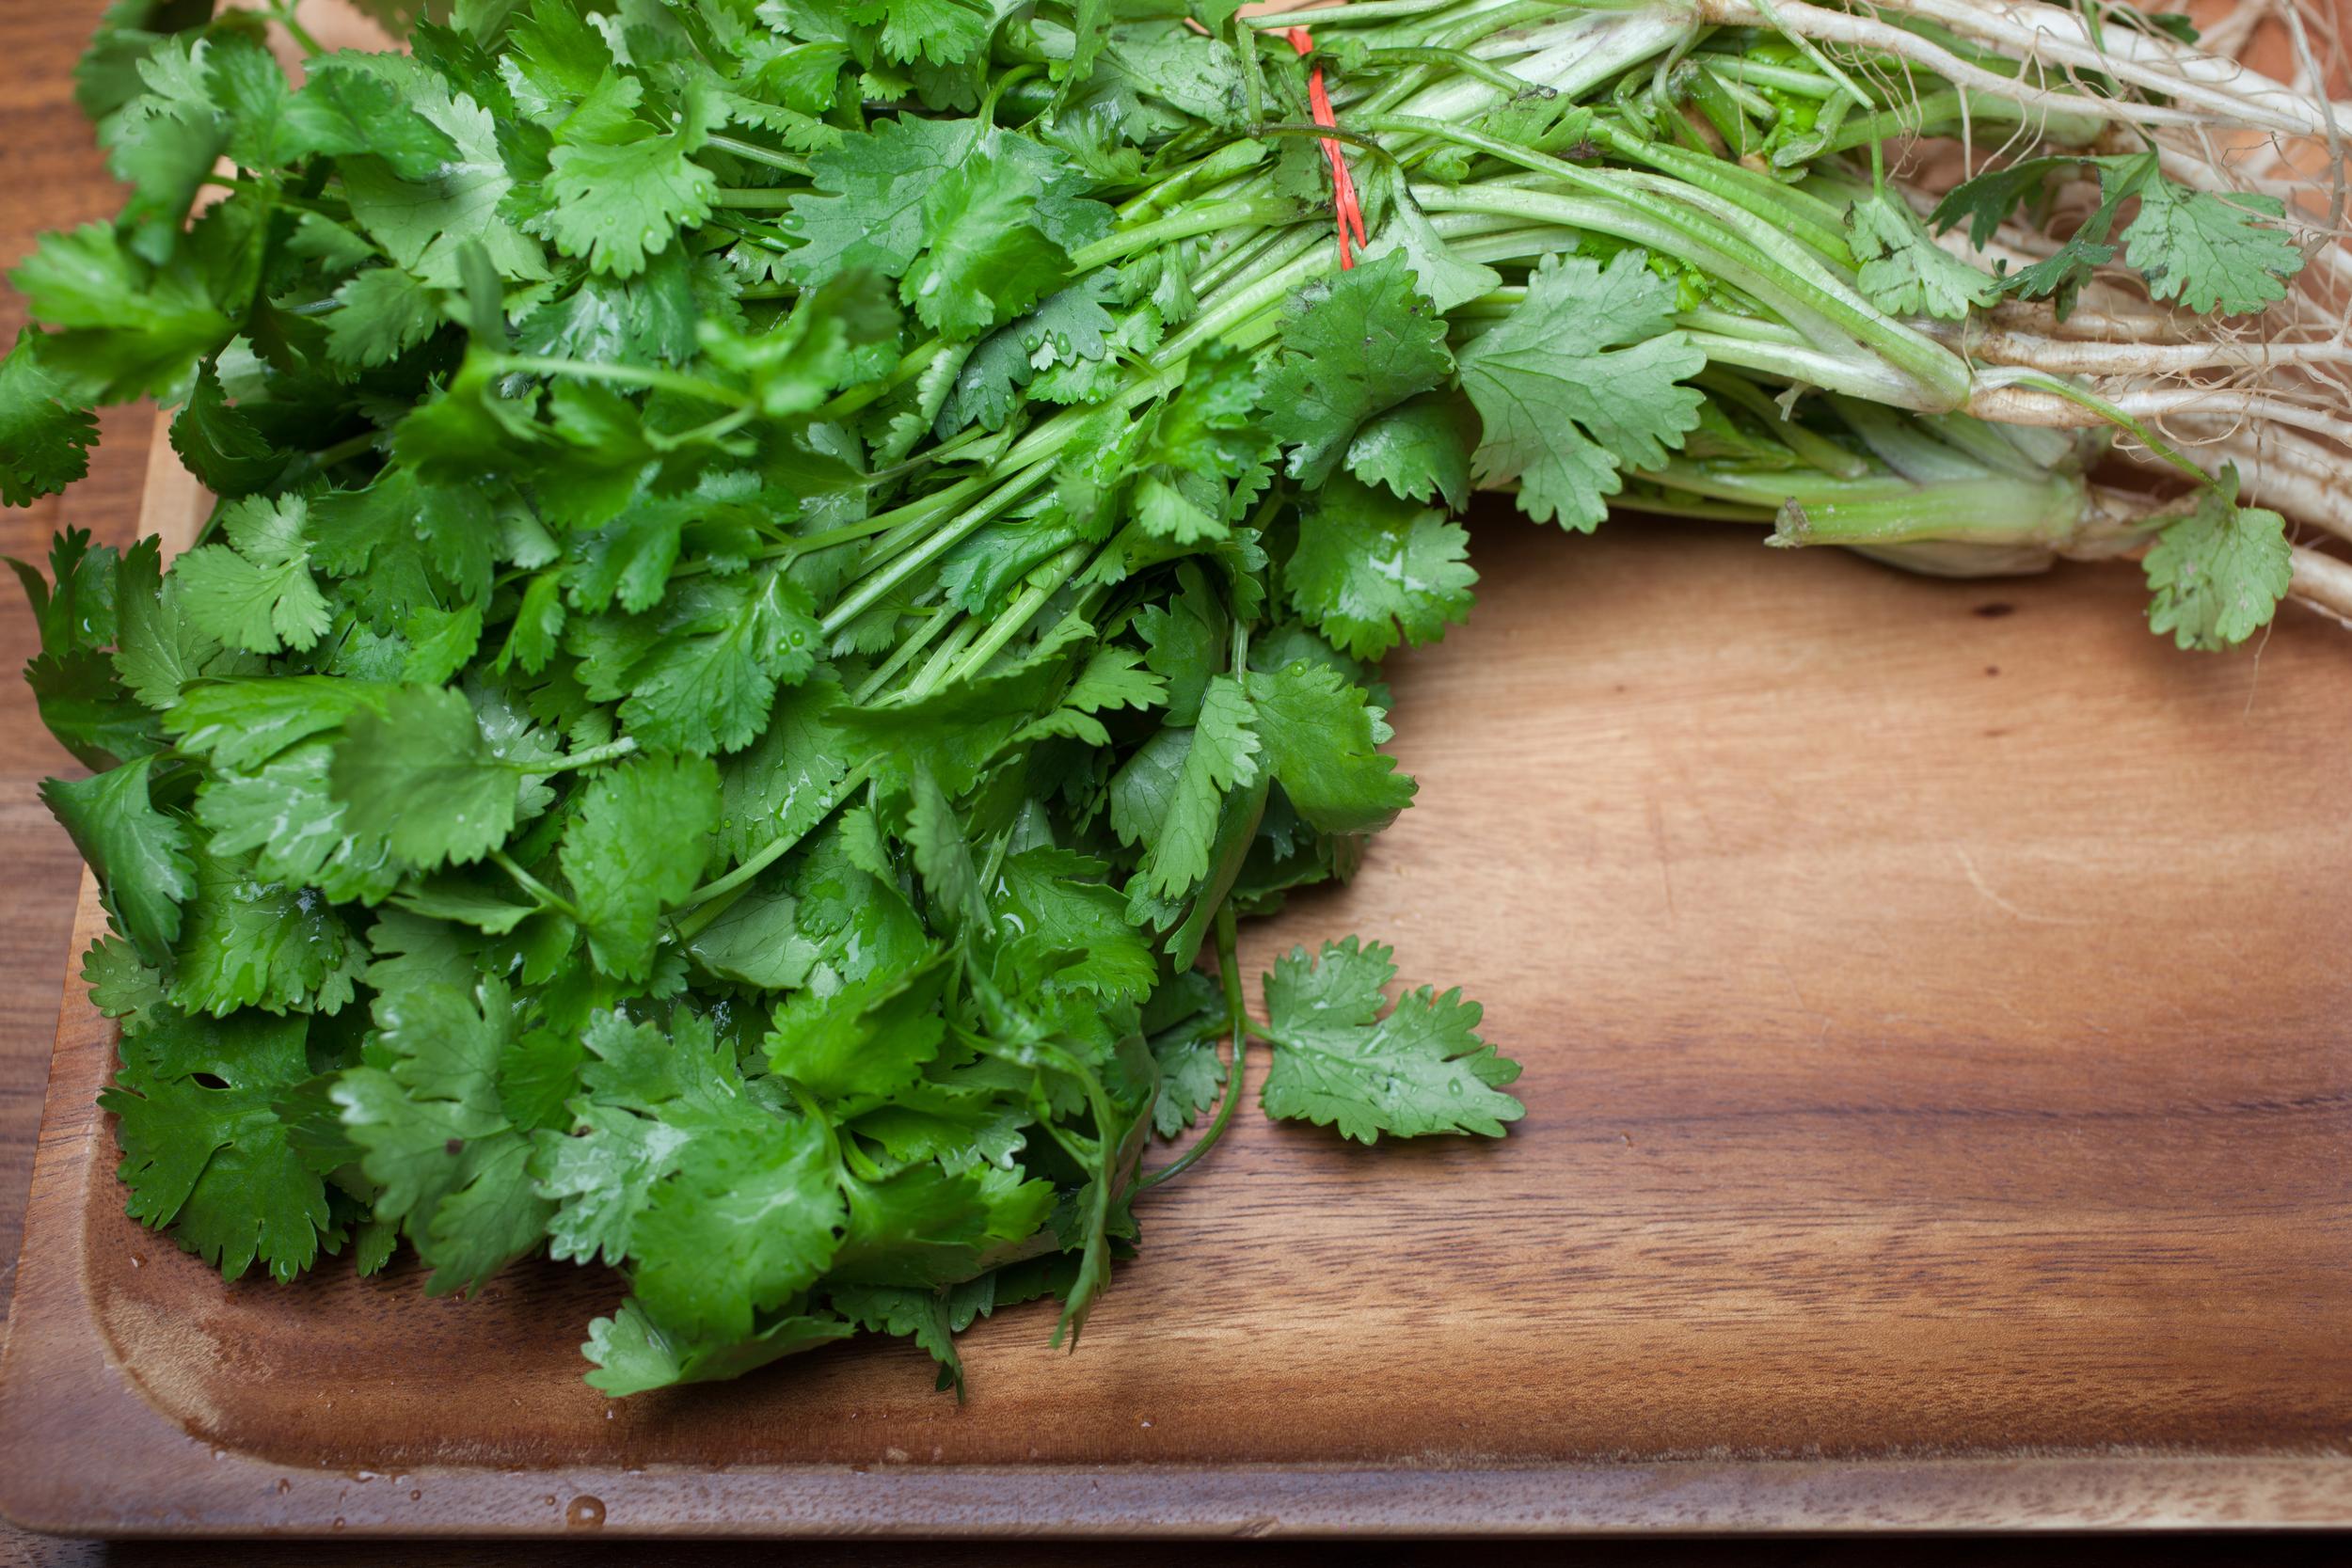 mademoiselle jules kale quinoa chickpeas healthy salad mlle jules food recipe coriander